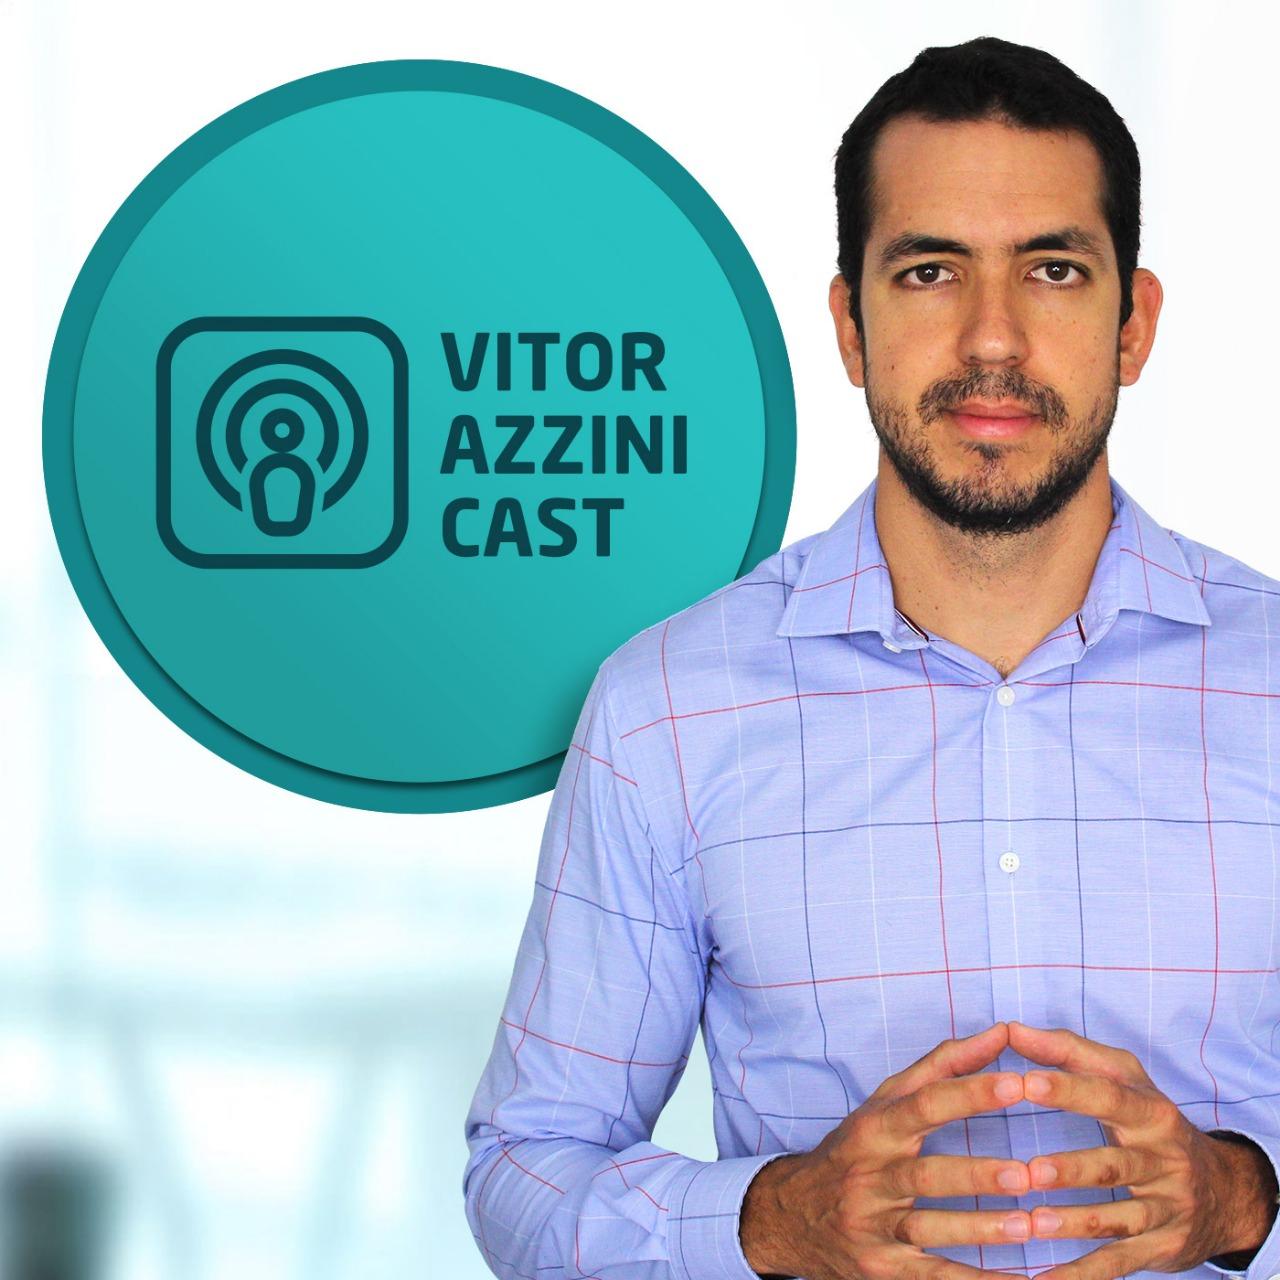 Vitor Azzini Cast show art